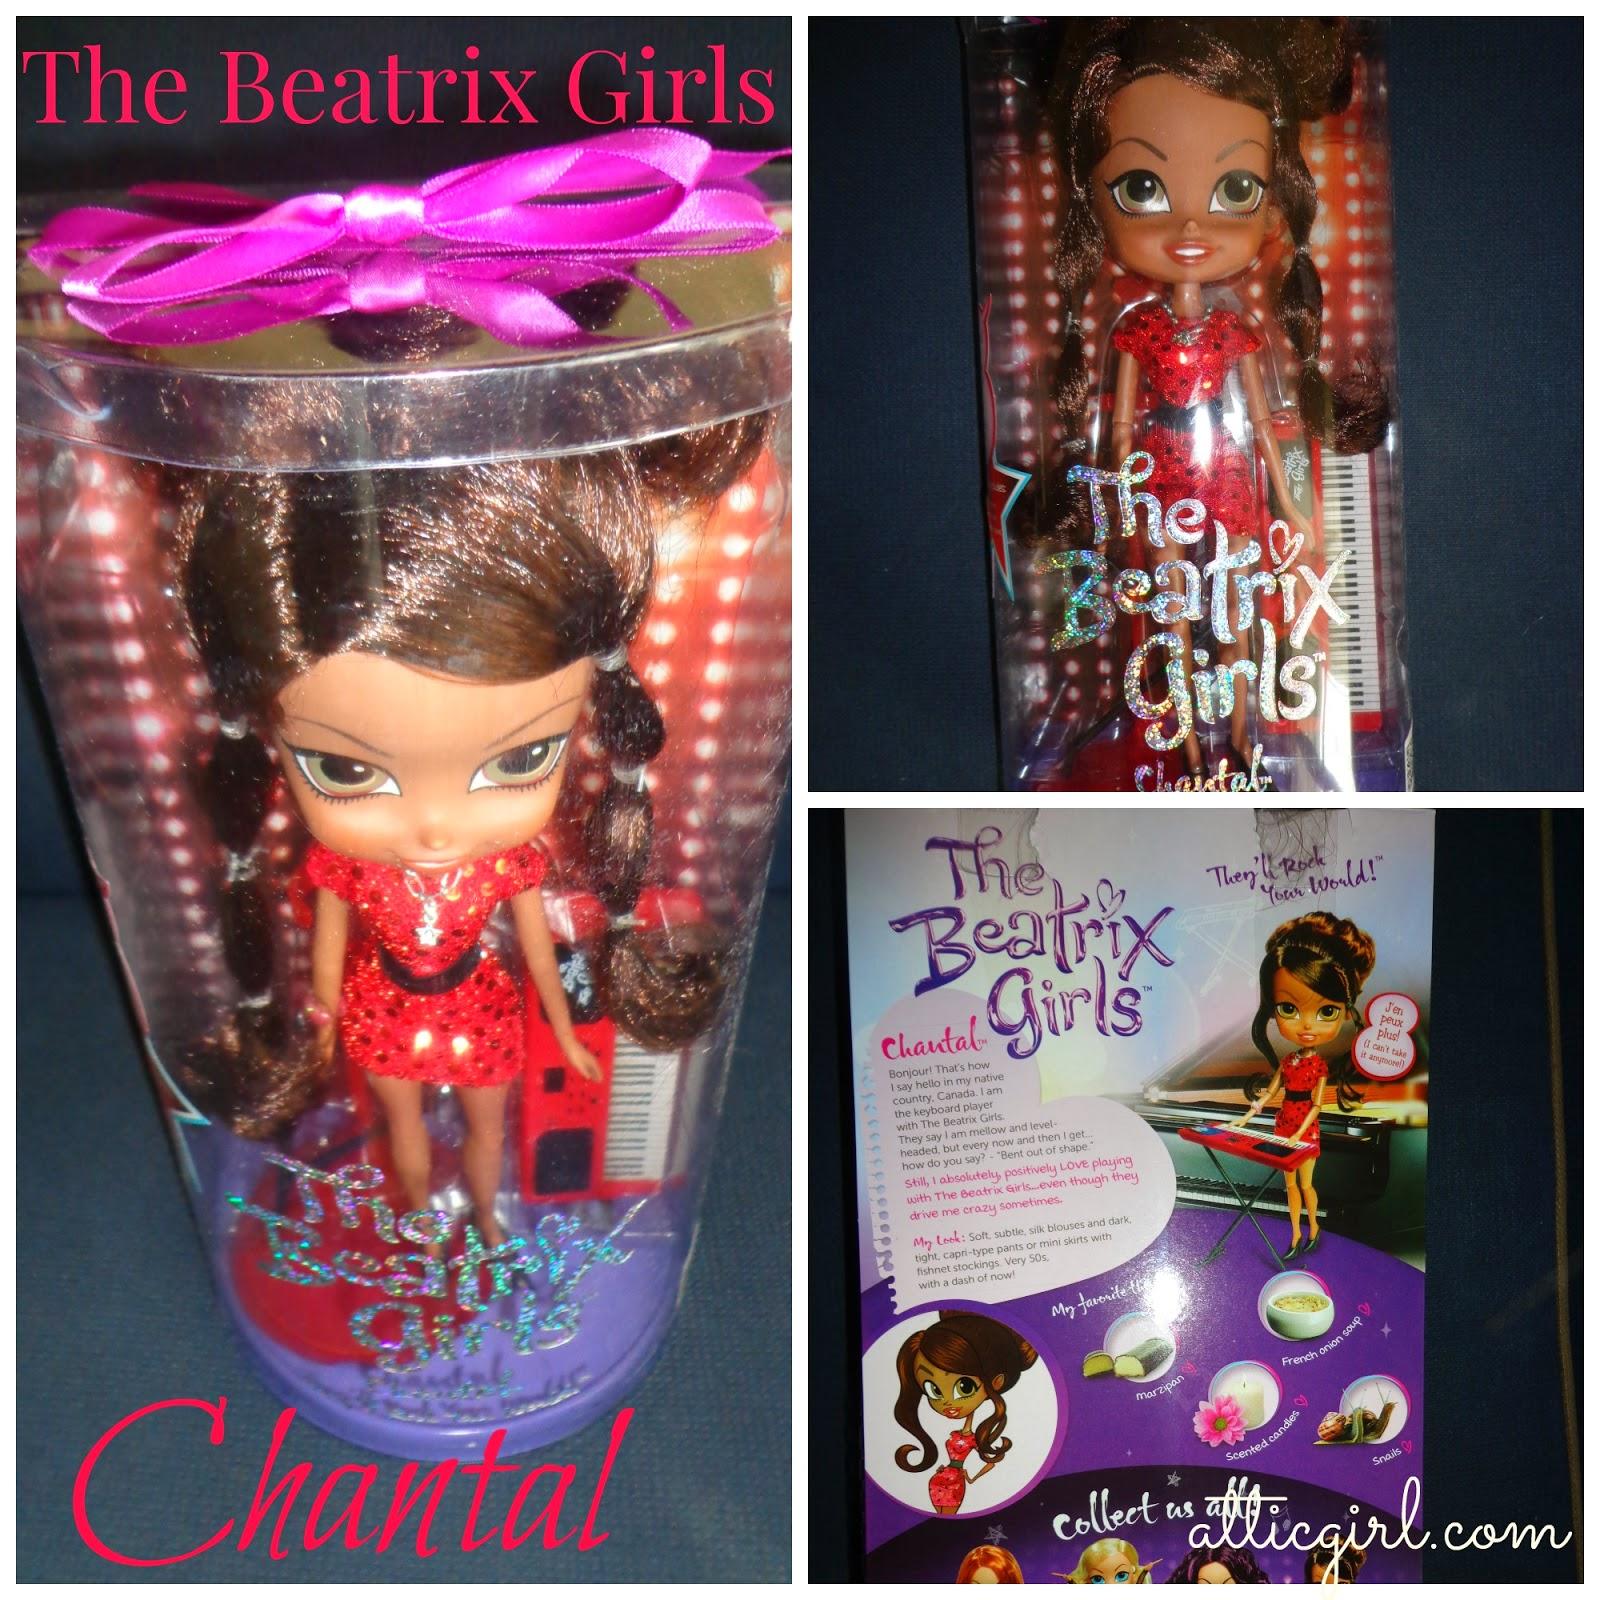 The Beatrix Girls